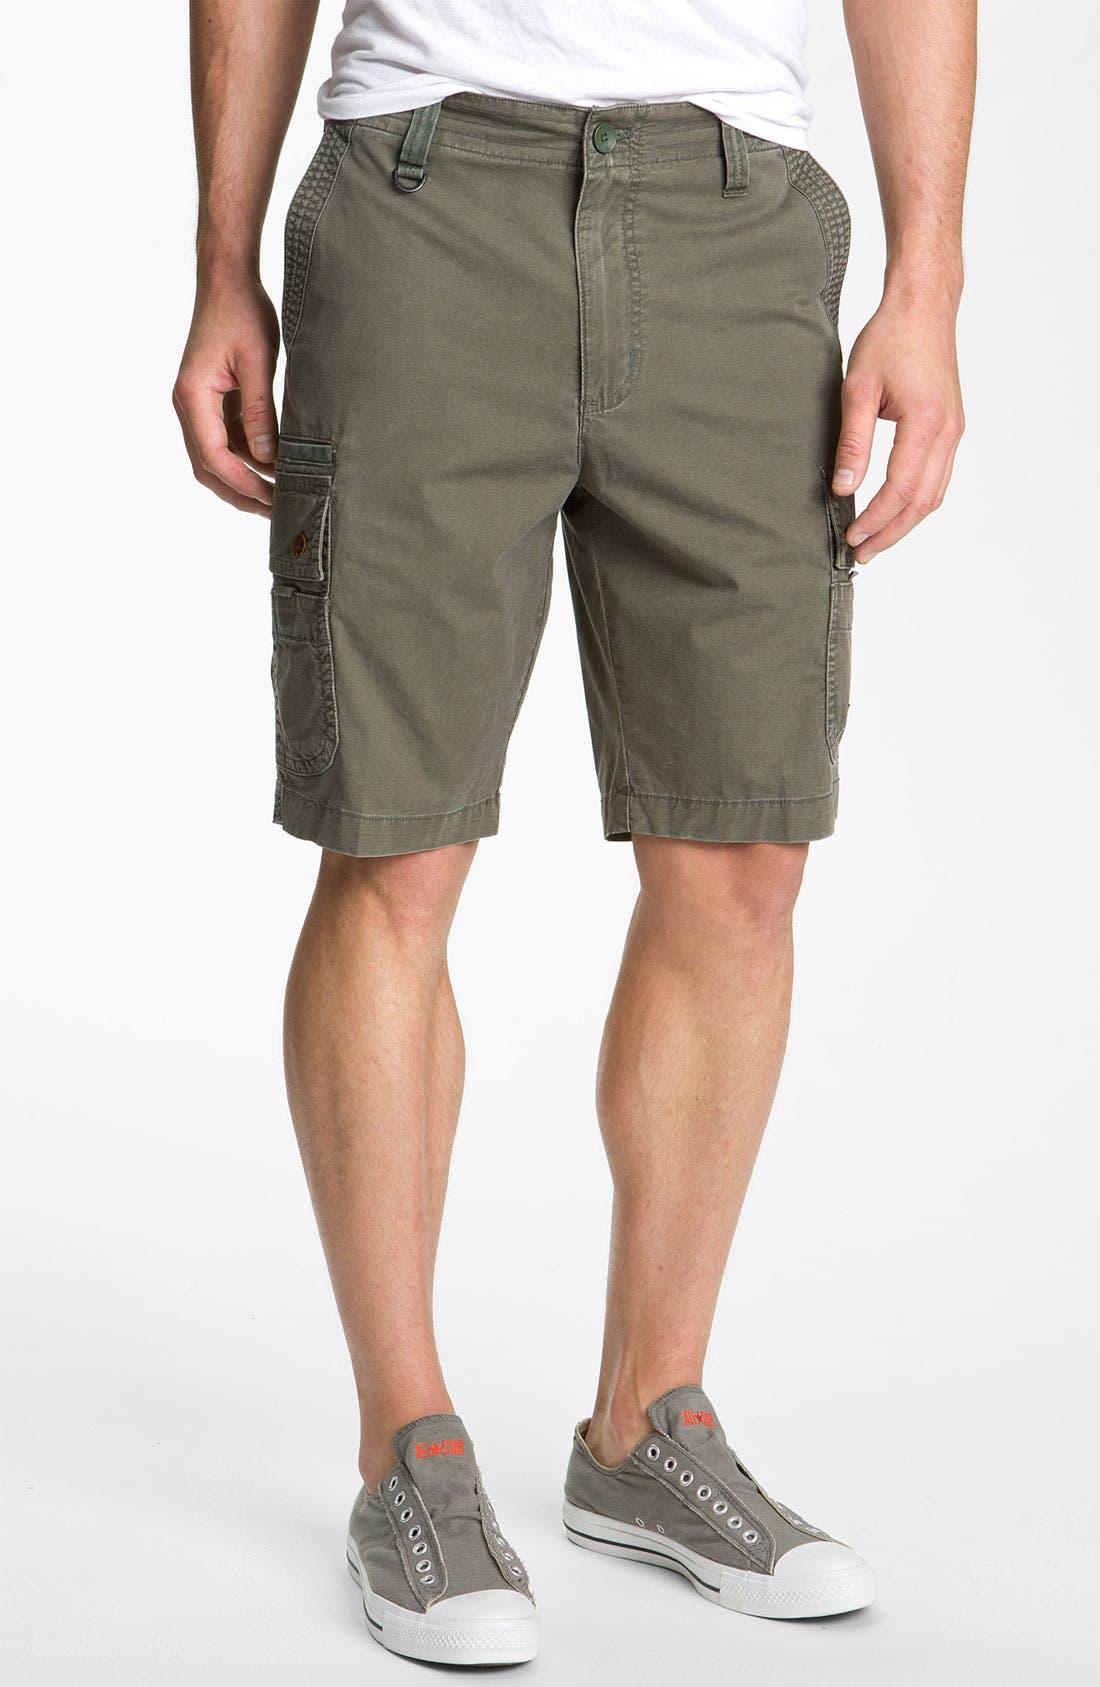 Alternate Image 1 Selected - Quiksilver 'Passport' Cargo Shorts